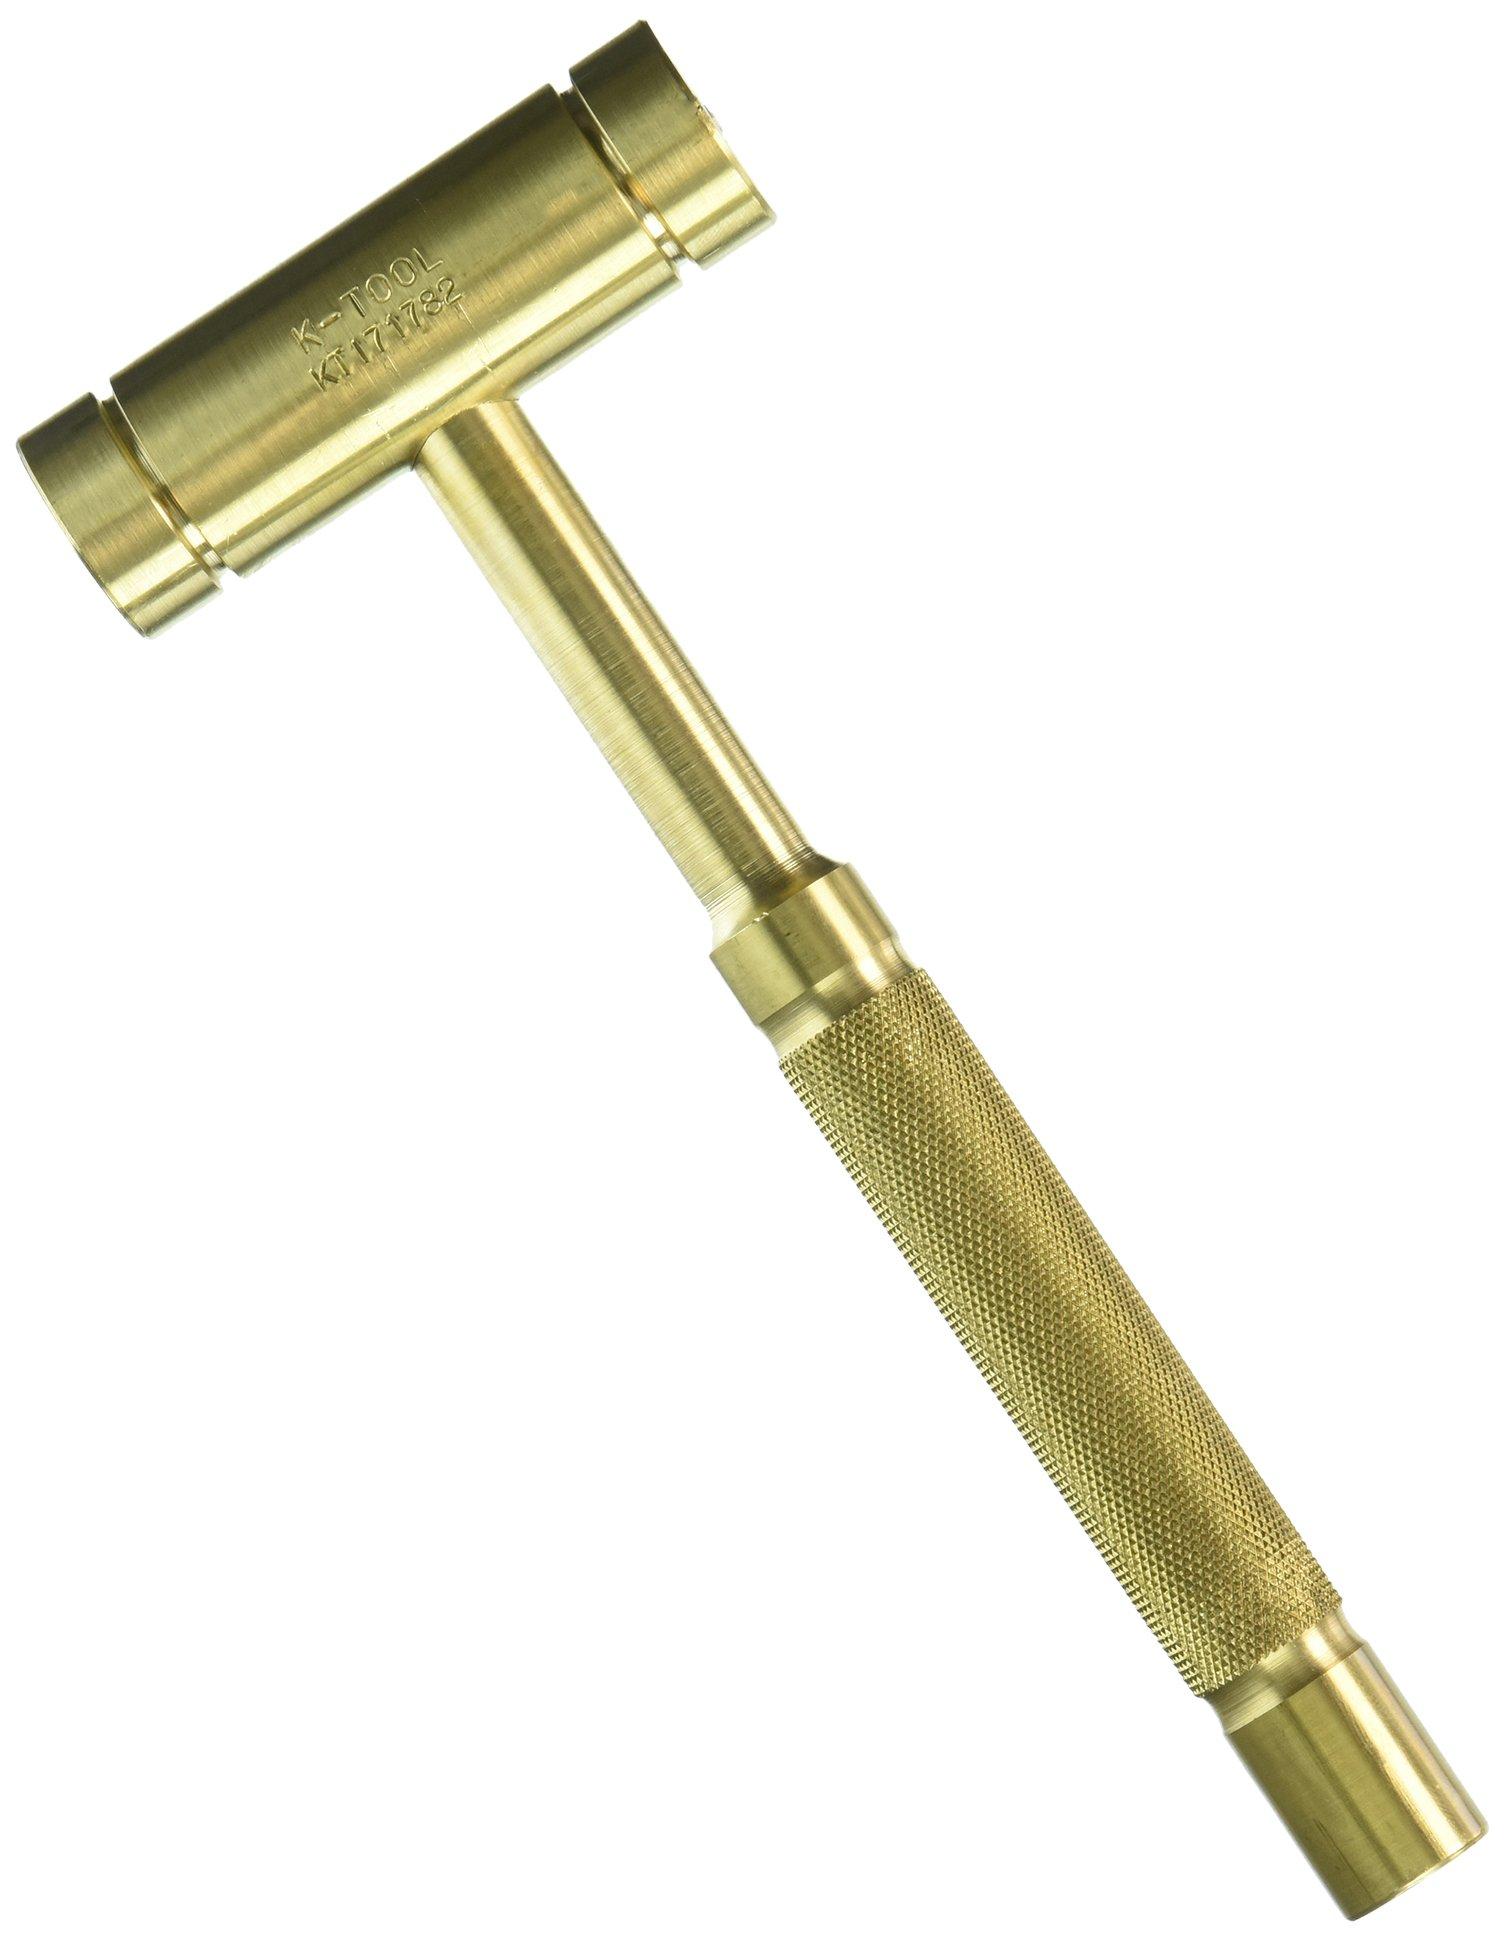 K-Tool International KTI (KTI-71782) Hammer